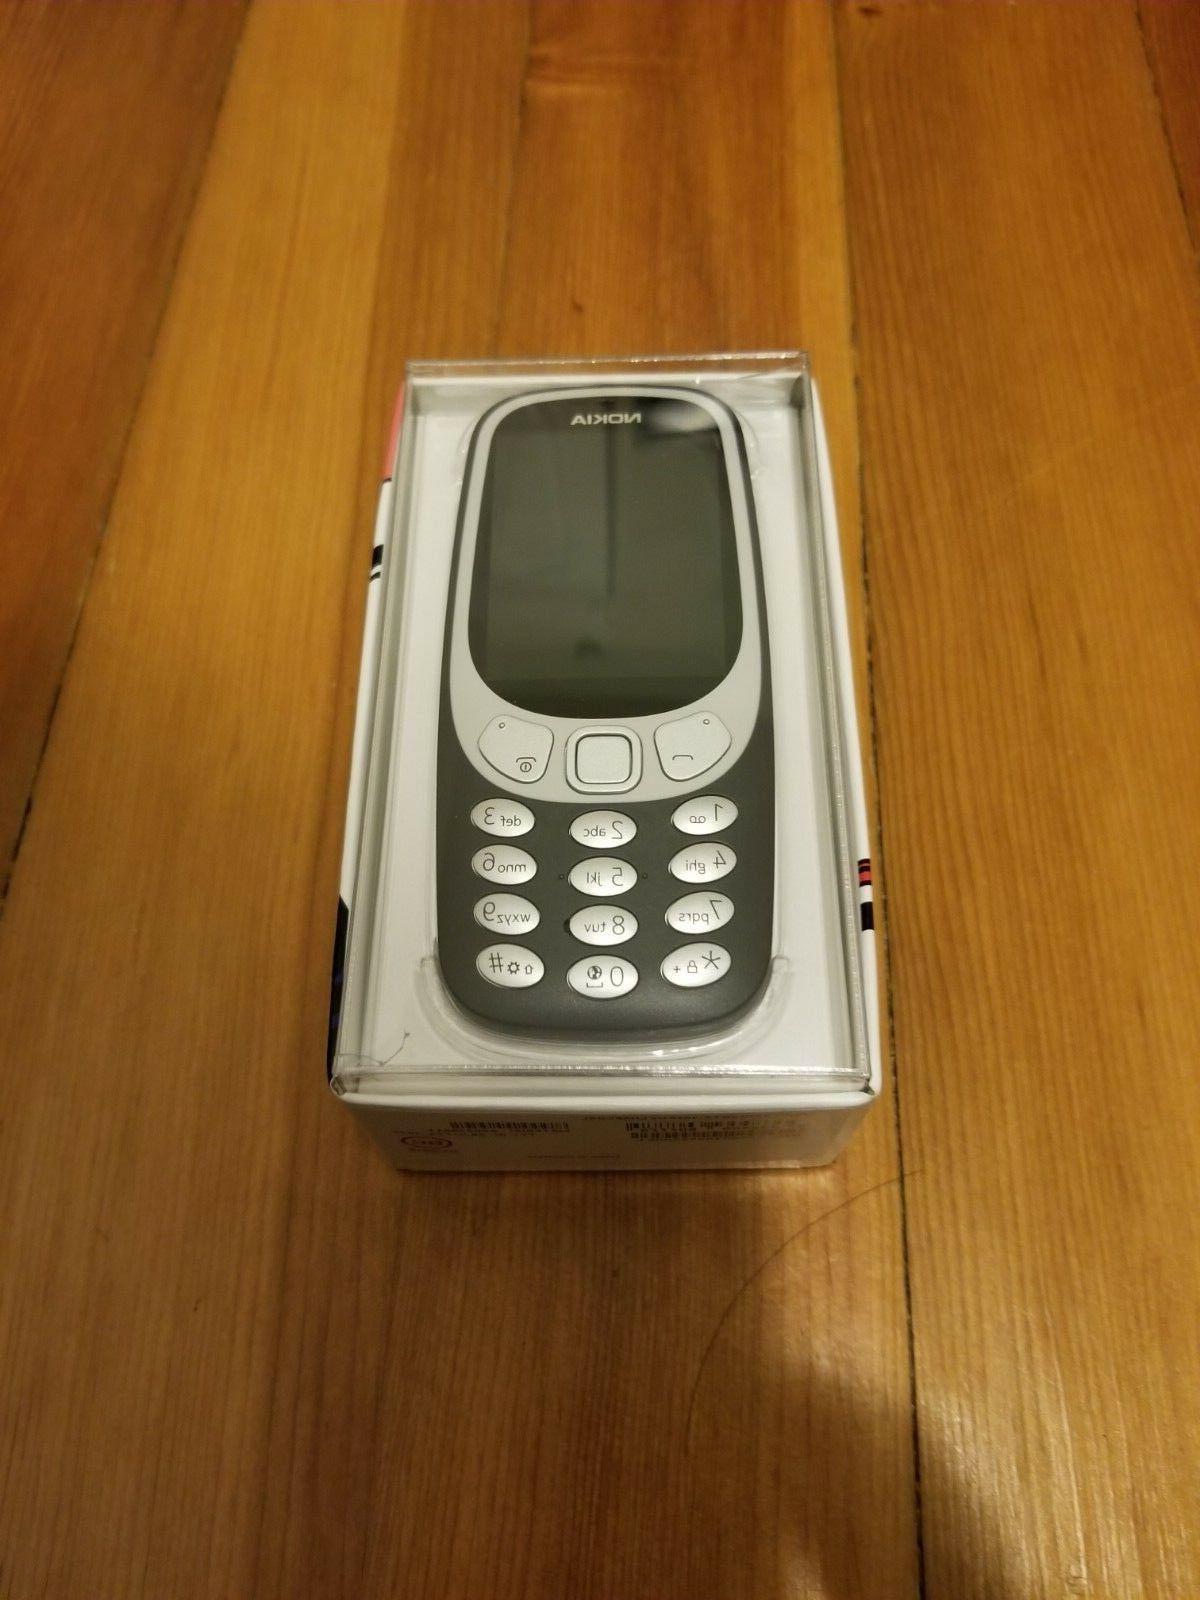 NOKIA 3310 3G - Unlocked - Charcoal